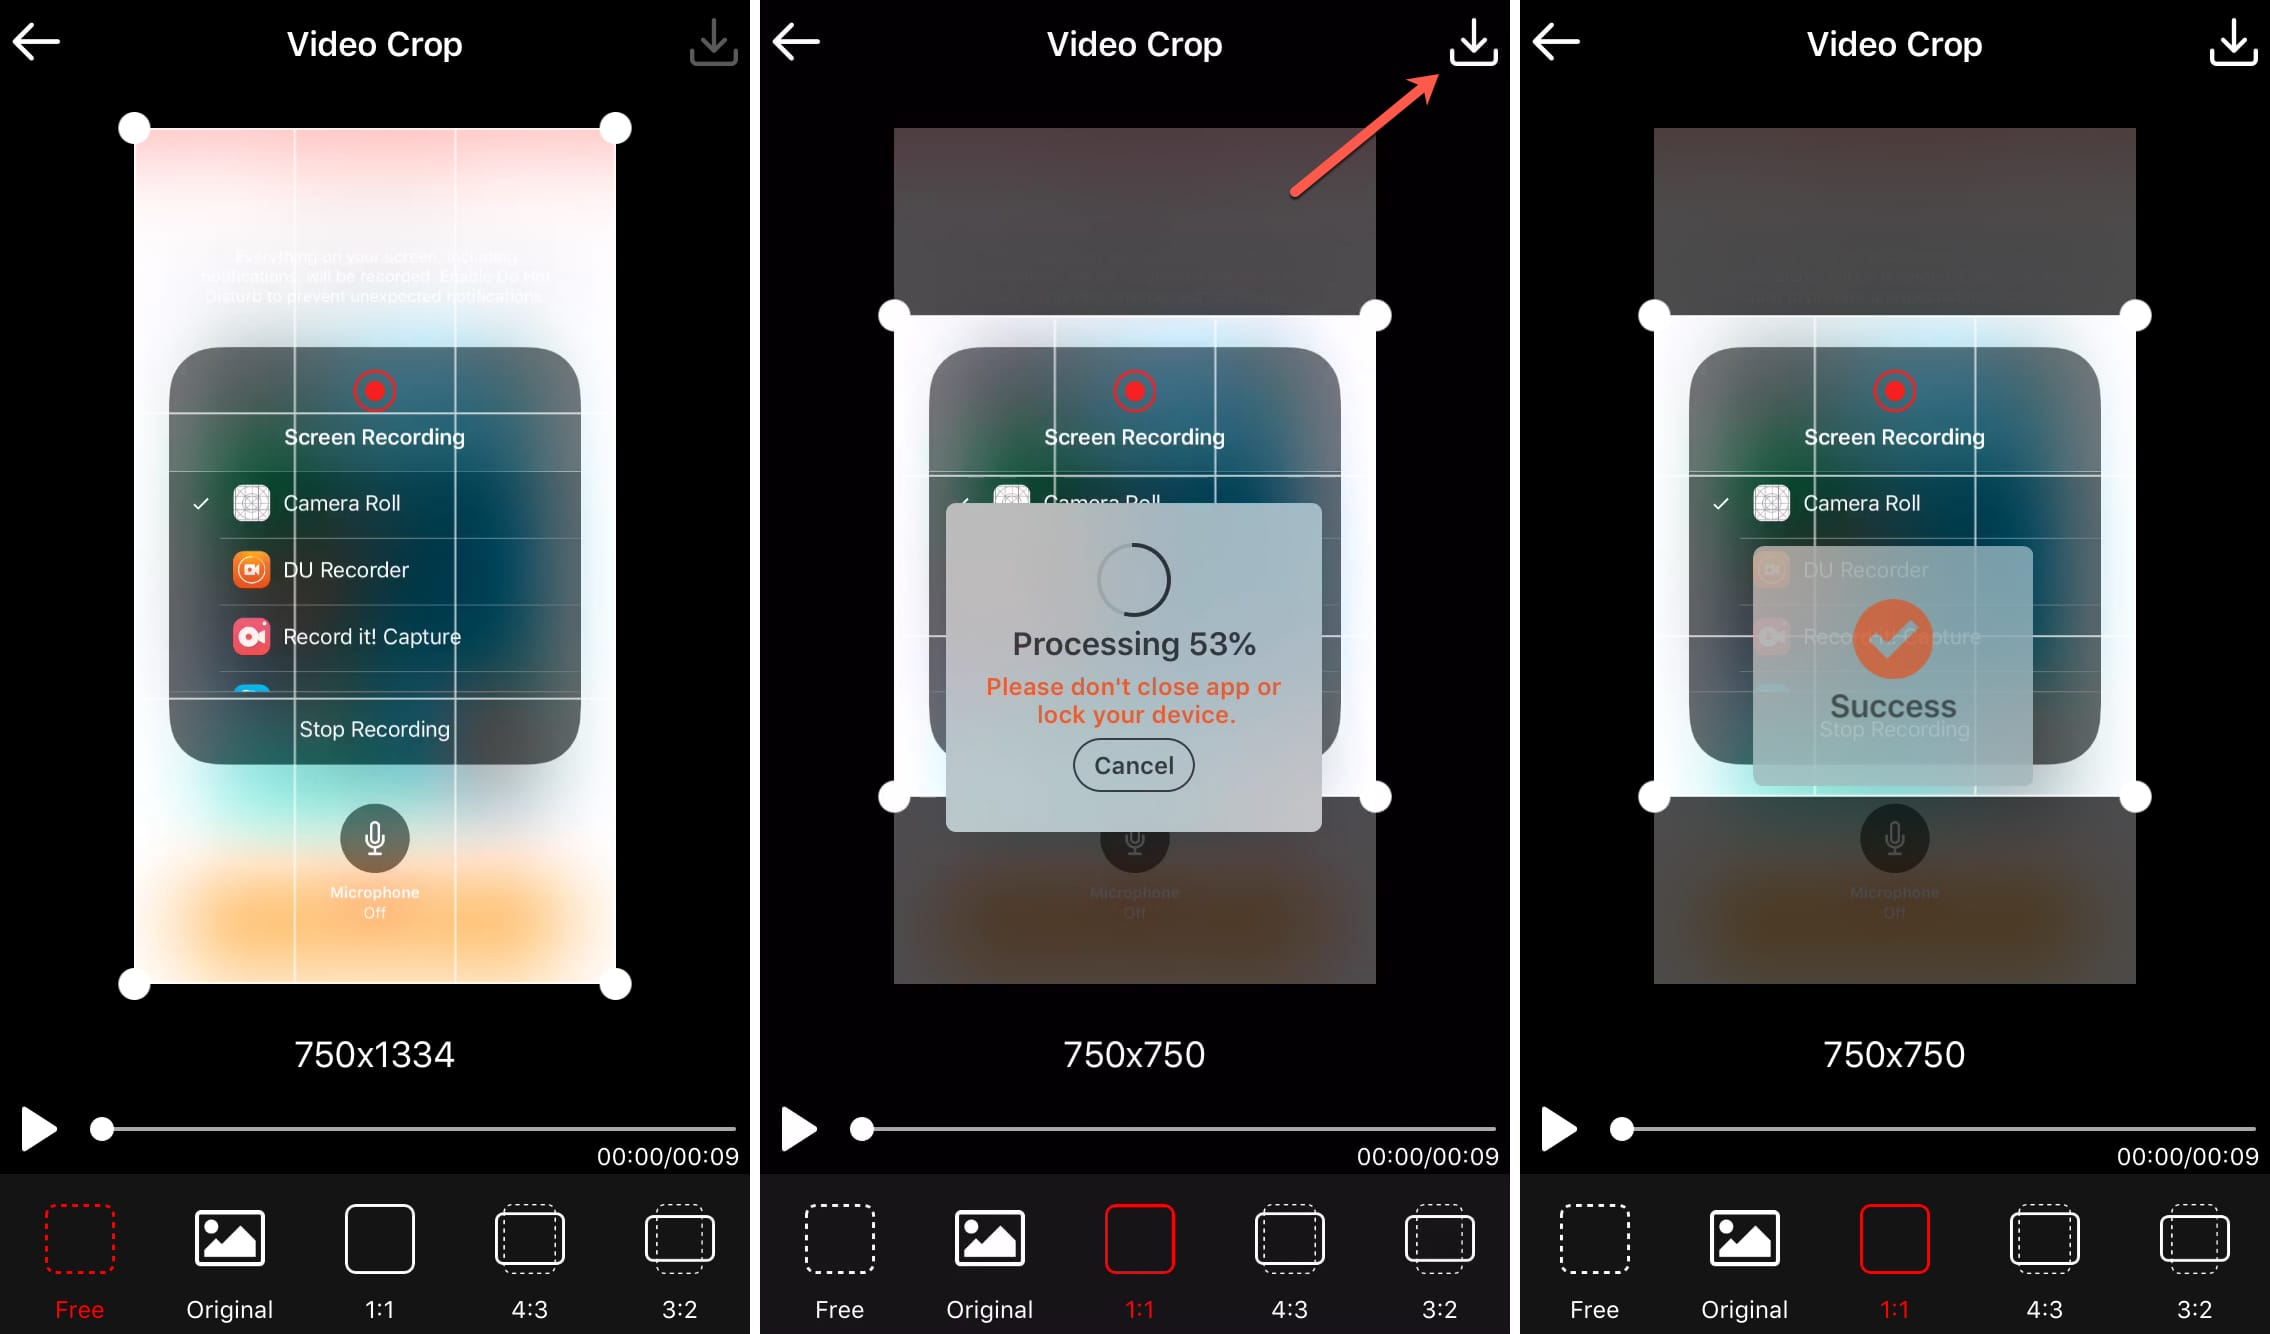 Crop Video Crop App on iPhone